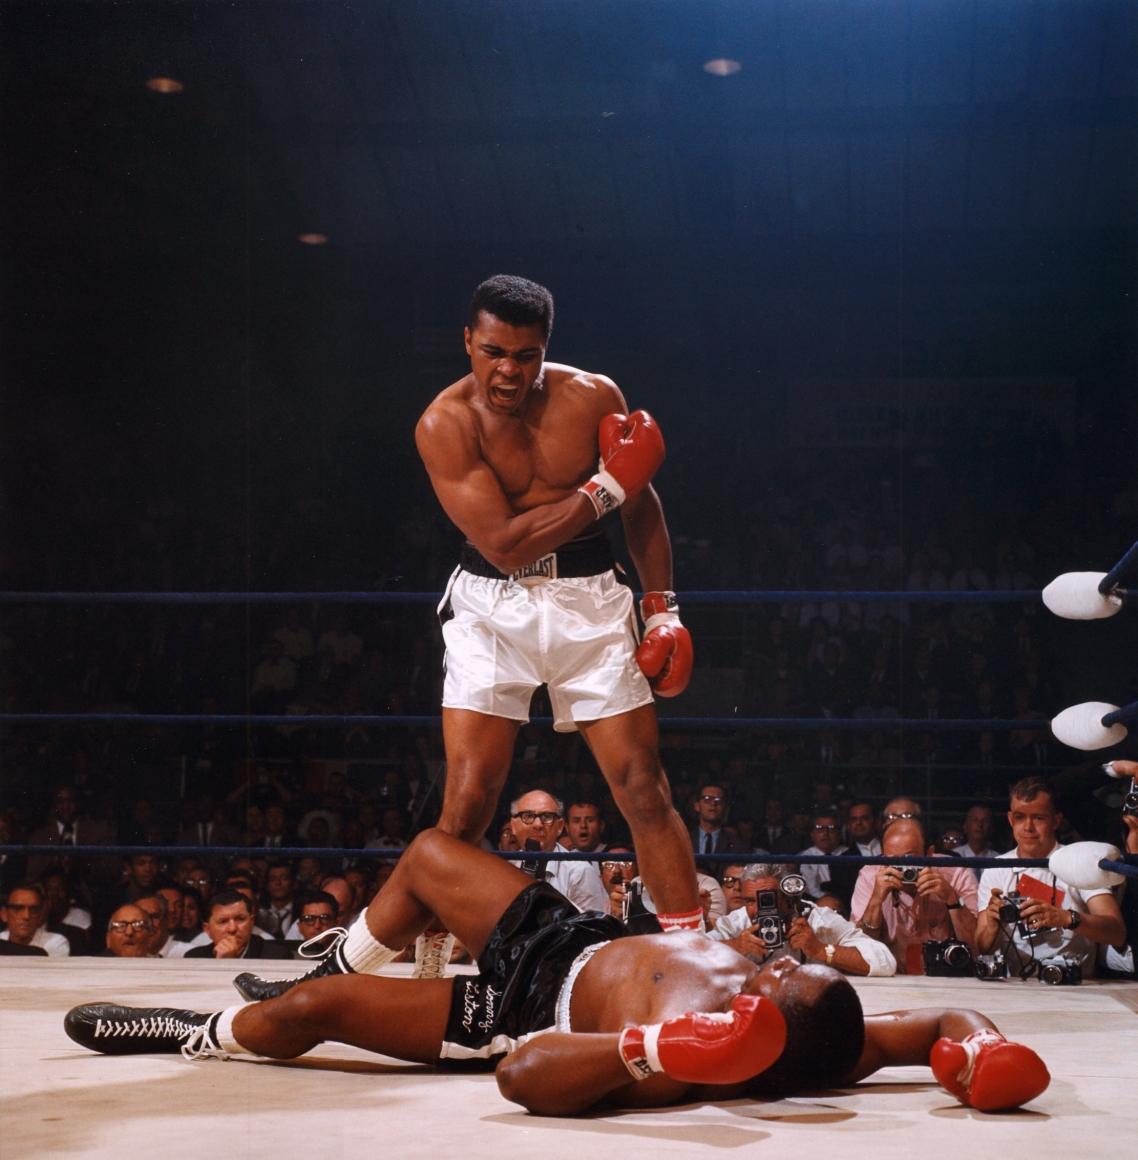 Neil Leifer photographie Muhammad Ali Sonny Liston